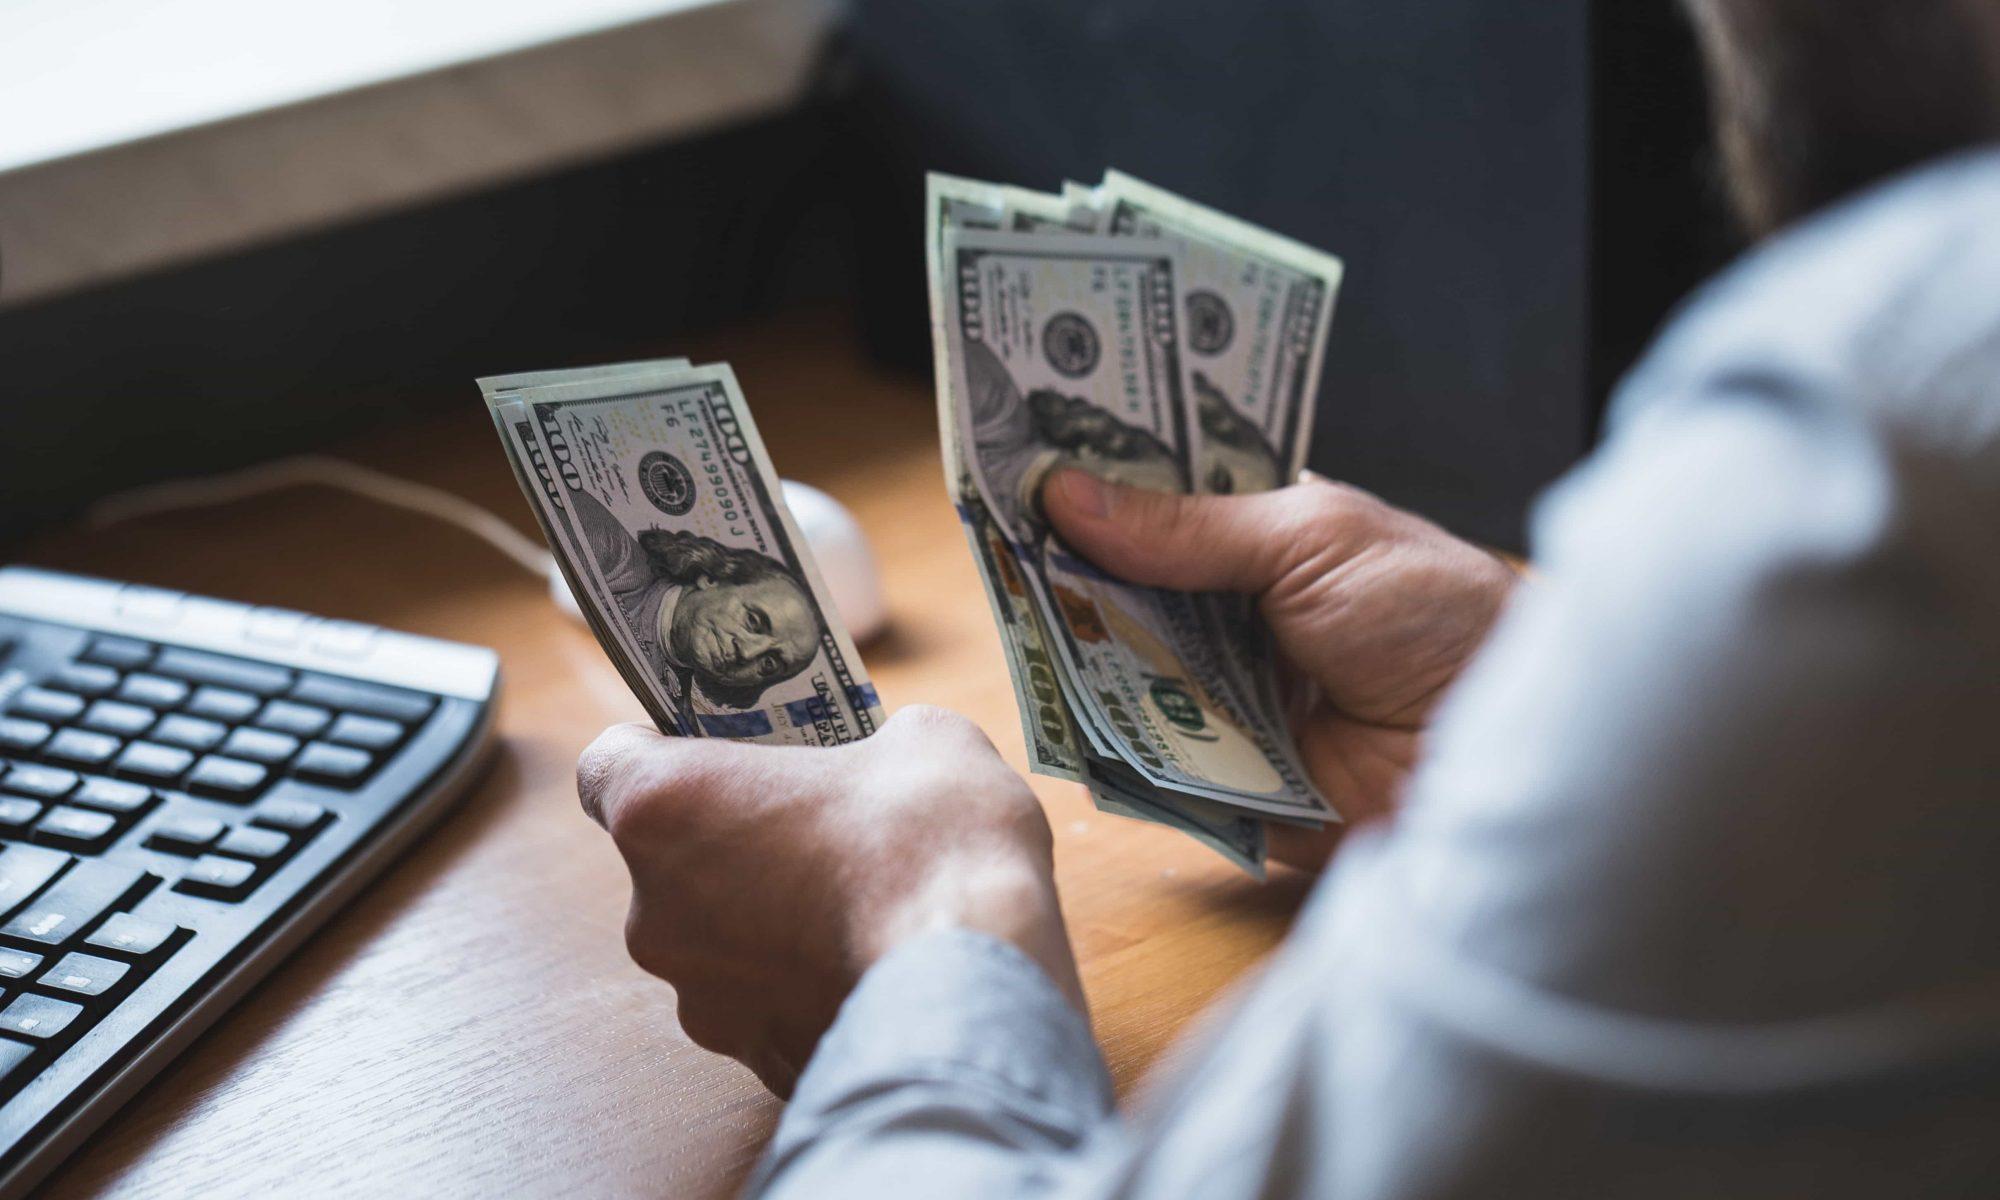 Gagner de l'argent en ligne. Comment s'y prendre ?